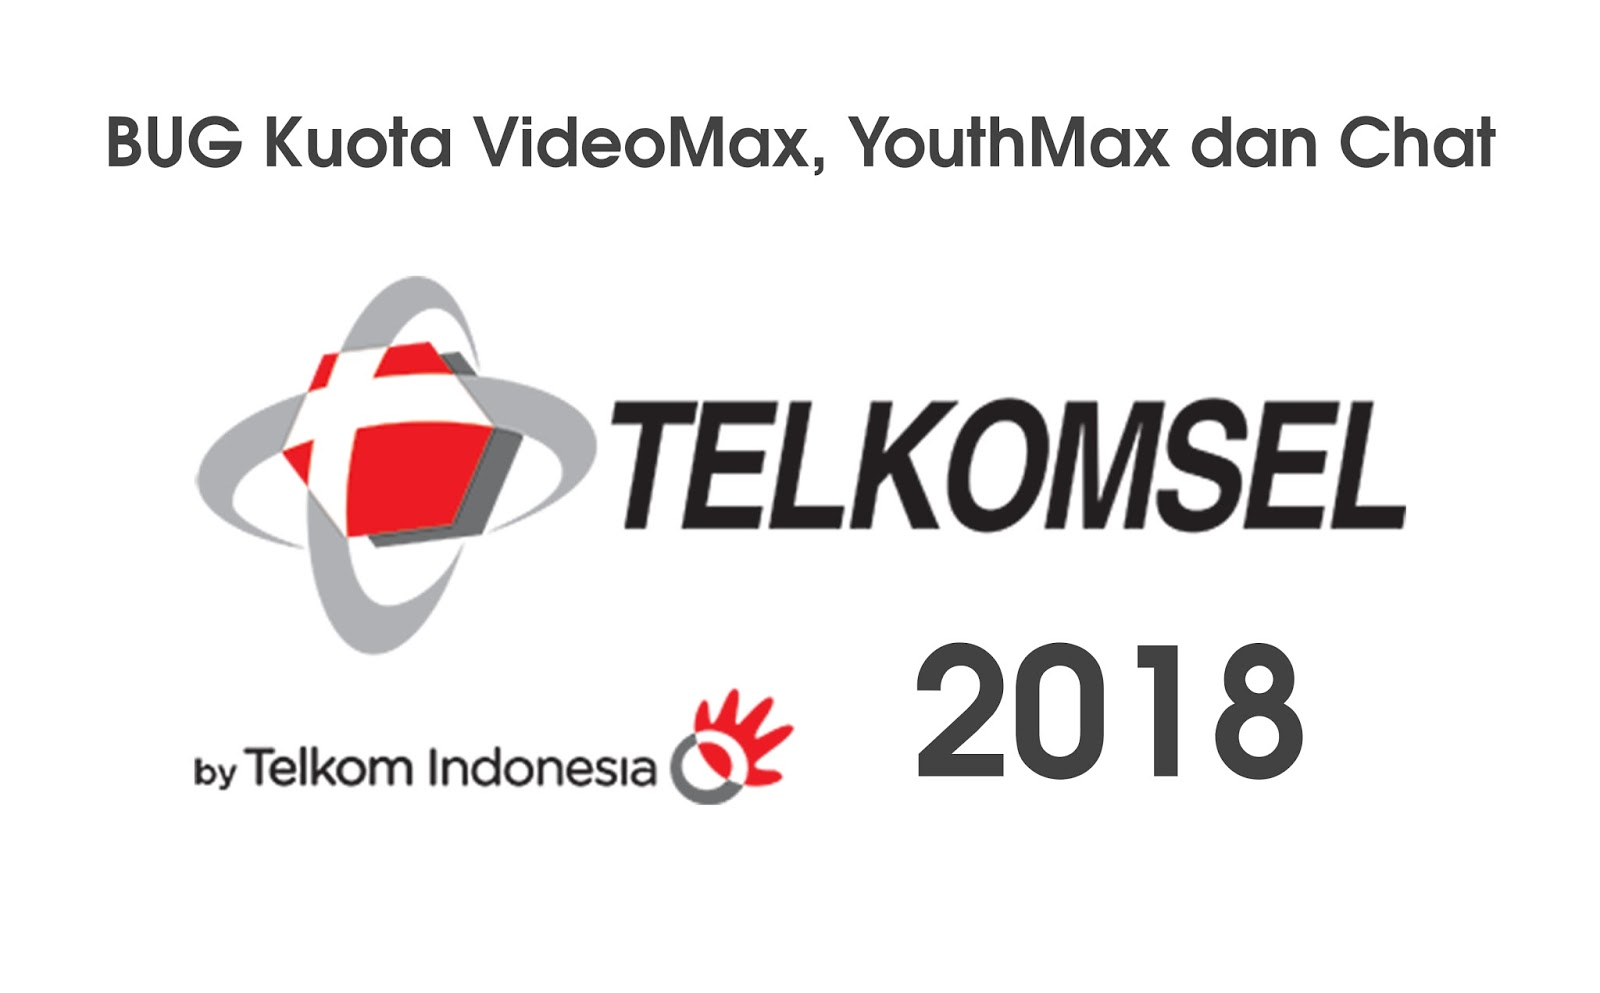 Daftar Bug Telkomsel Terbaru Aktif 2018 Videomax, Youthmax